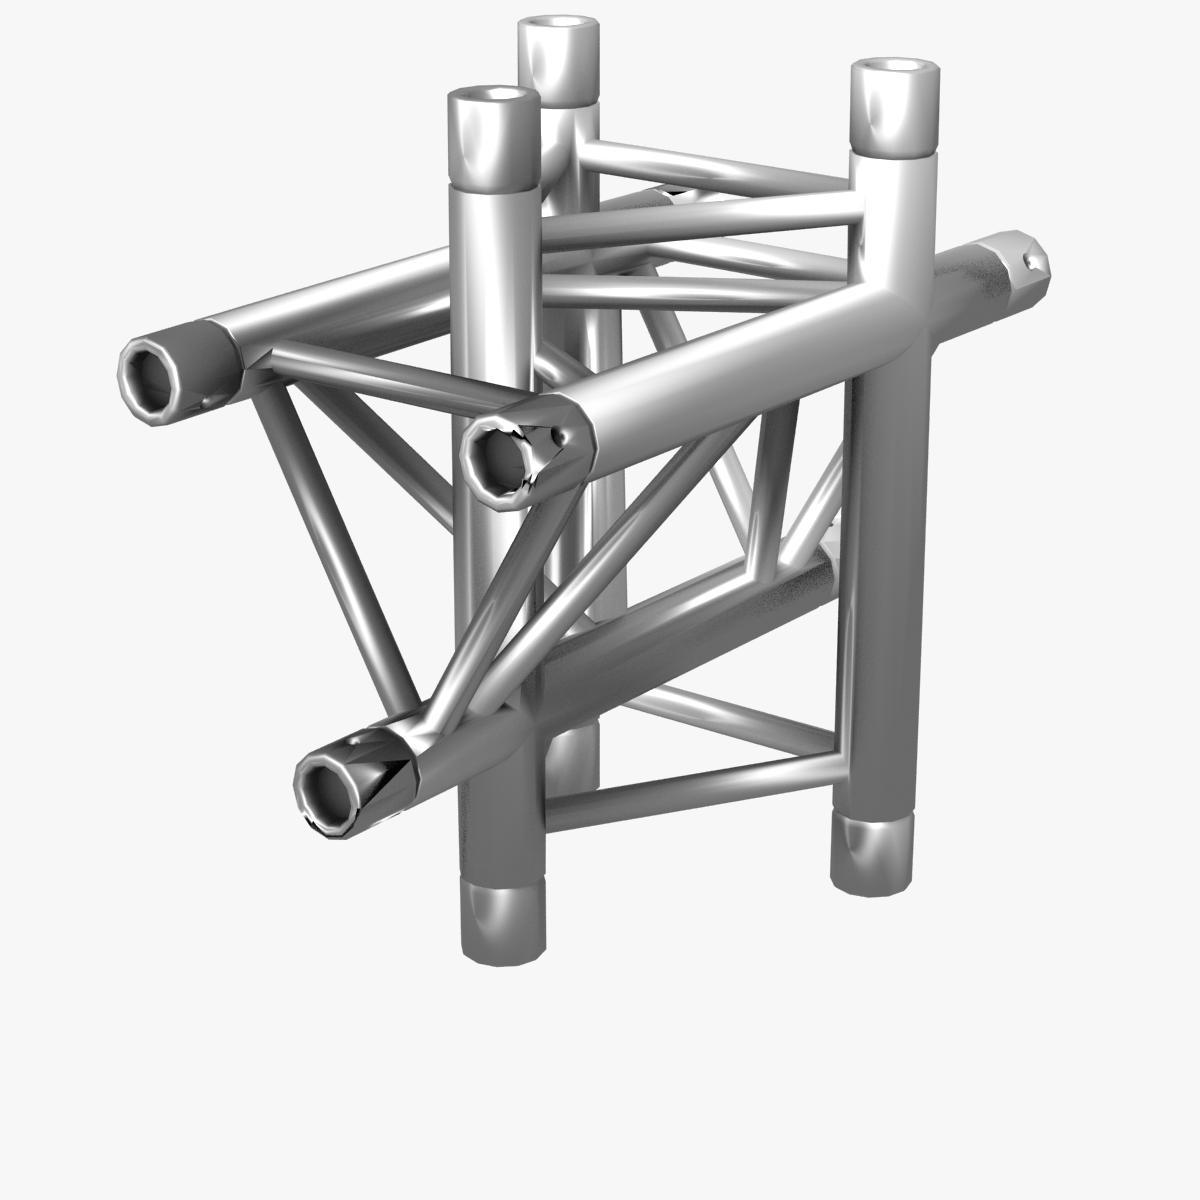 triangular trusses (collection 55 modular pieces) 3d model 3ds max dxf fbx c4d dae texture obj 216226